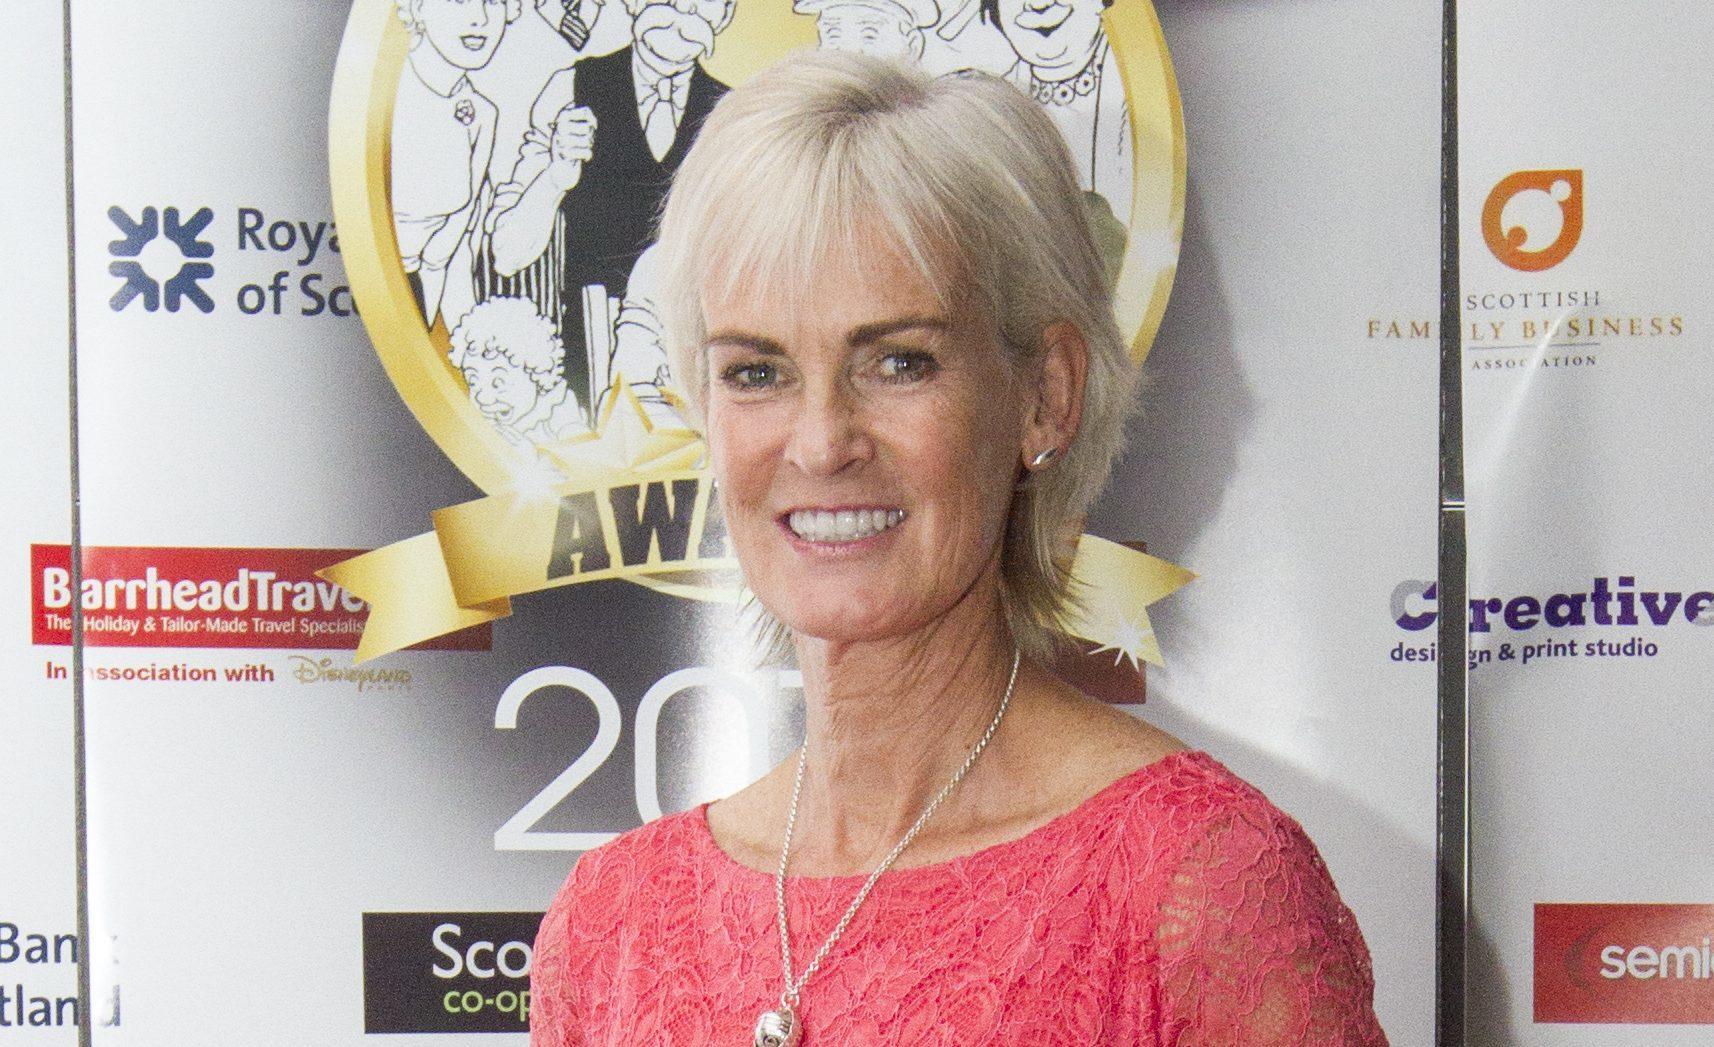 Judy Murray (Chris Austin / DC Thomson)